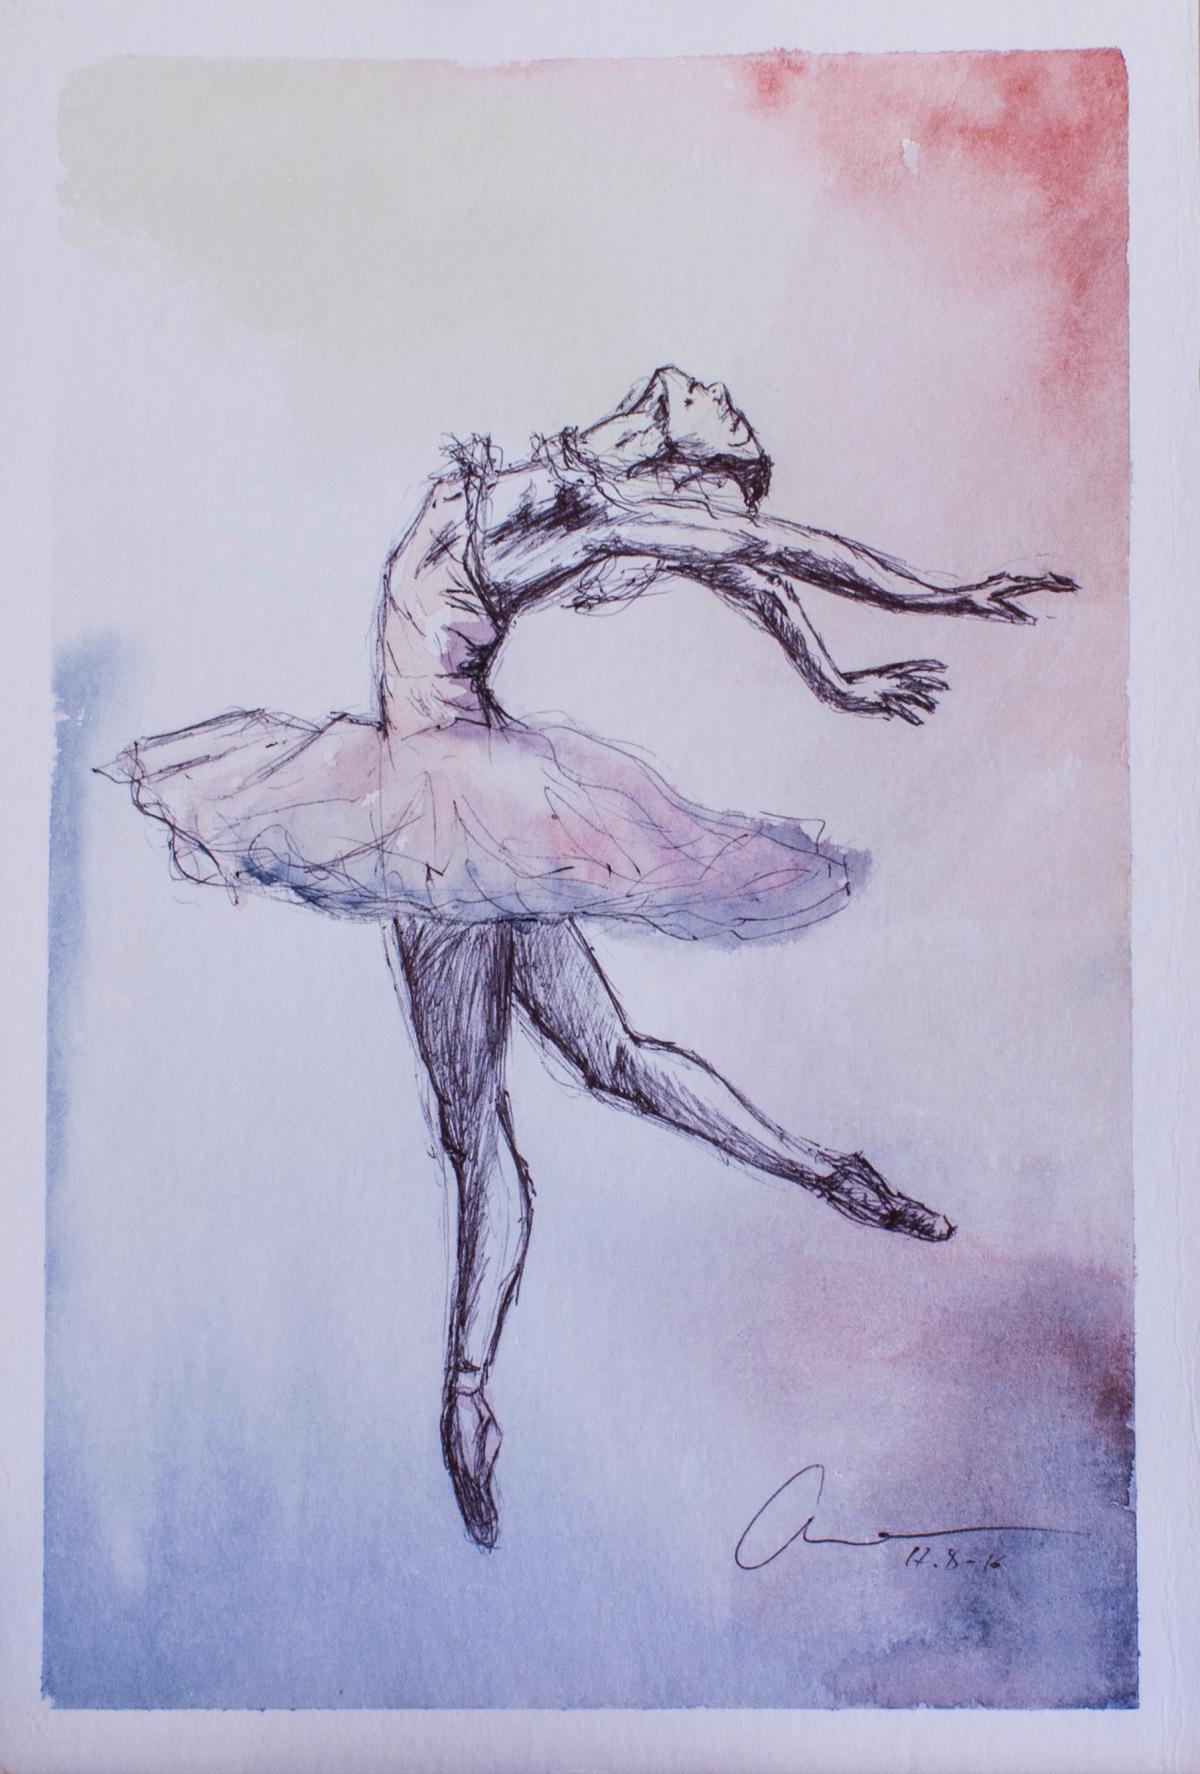 Bailarina. Watercolor and pen.